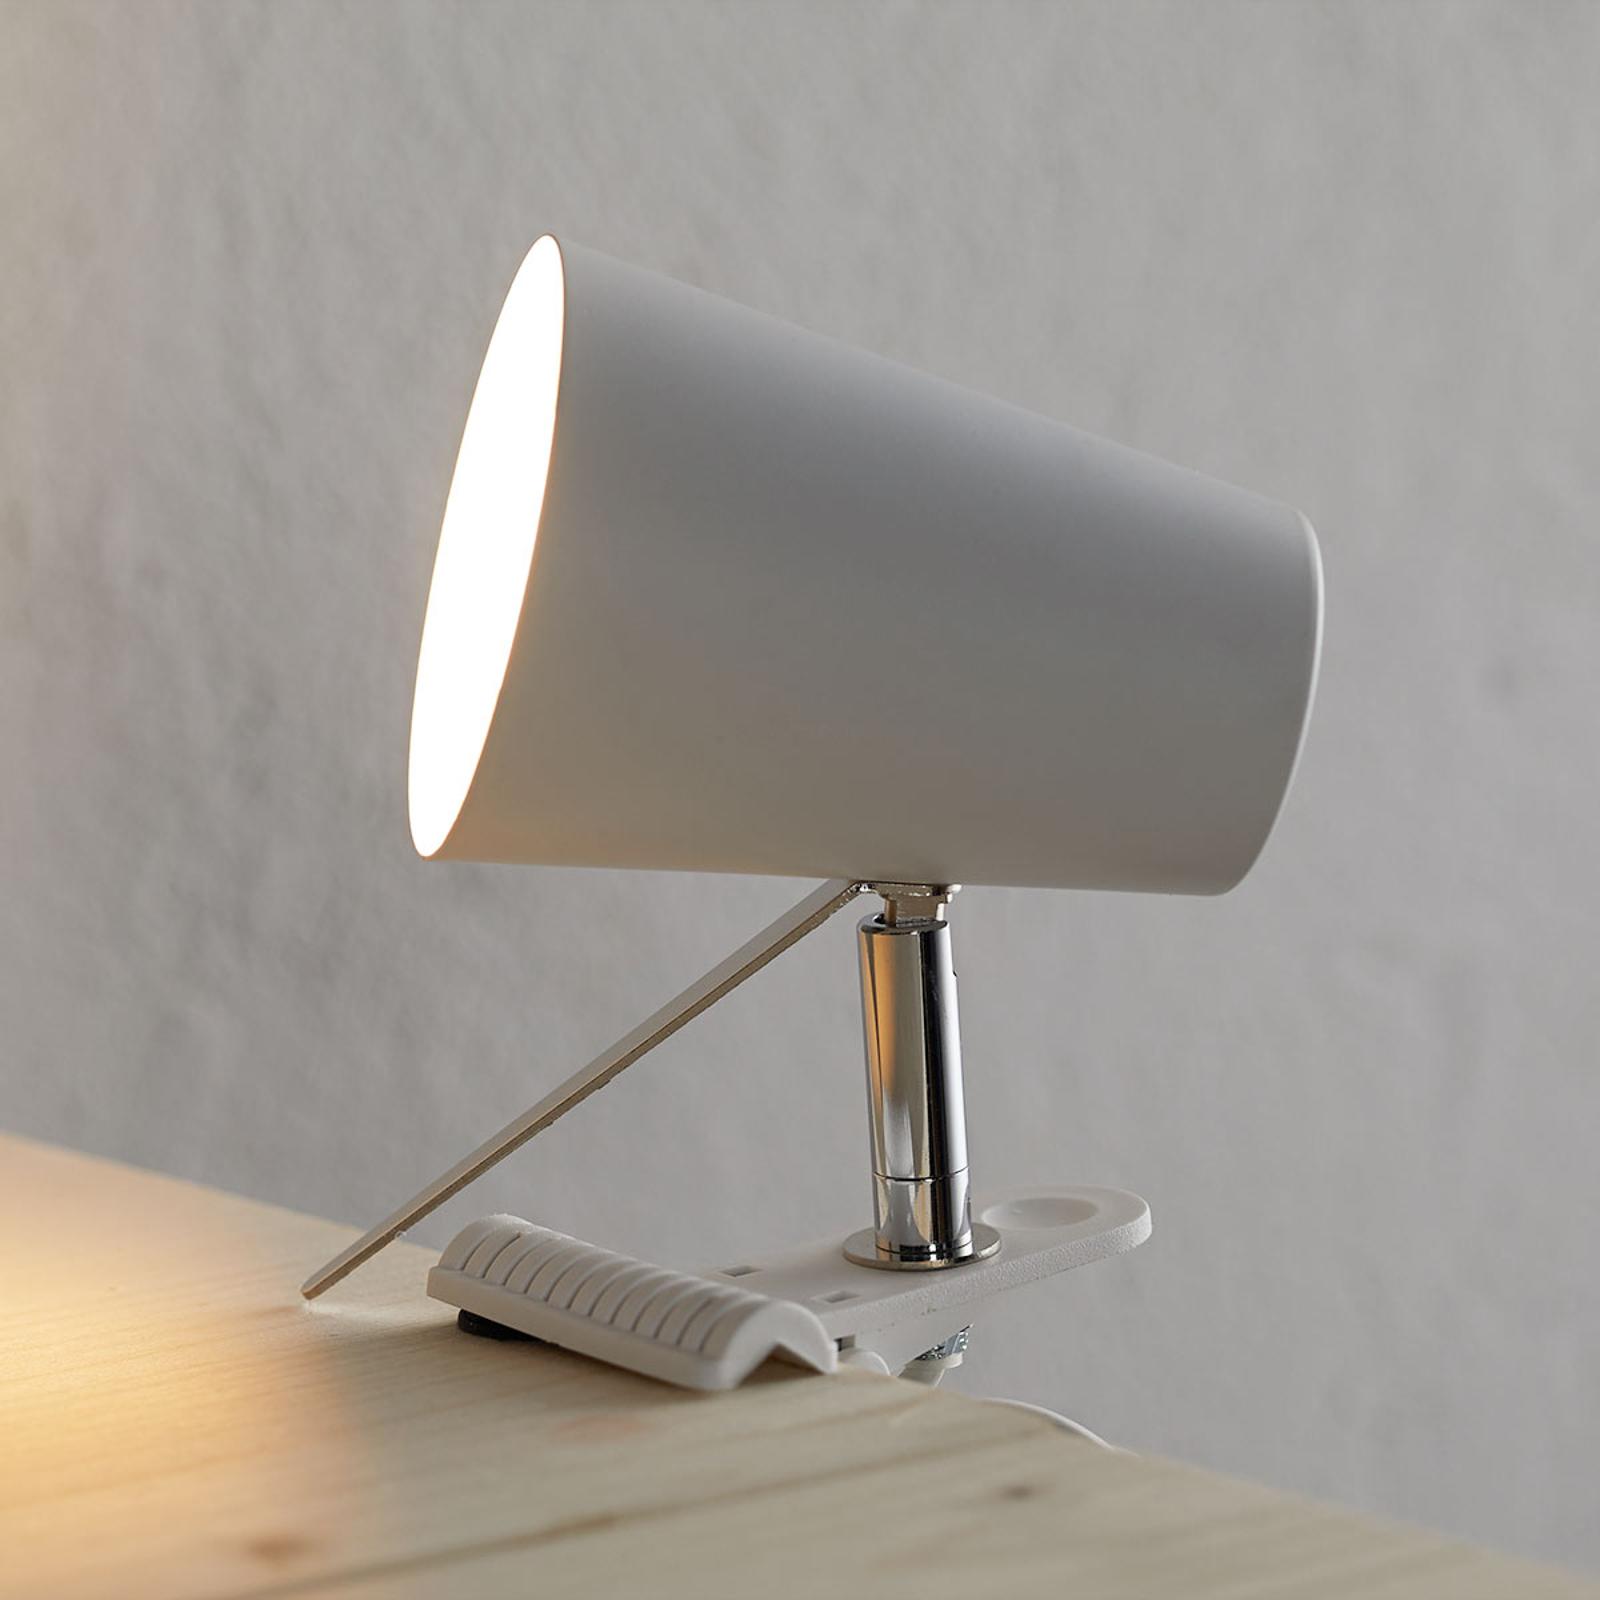 Moderna lampada Clampspots a pinza, bianco